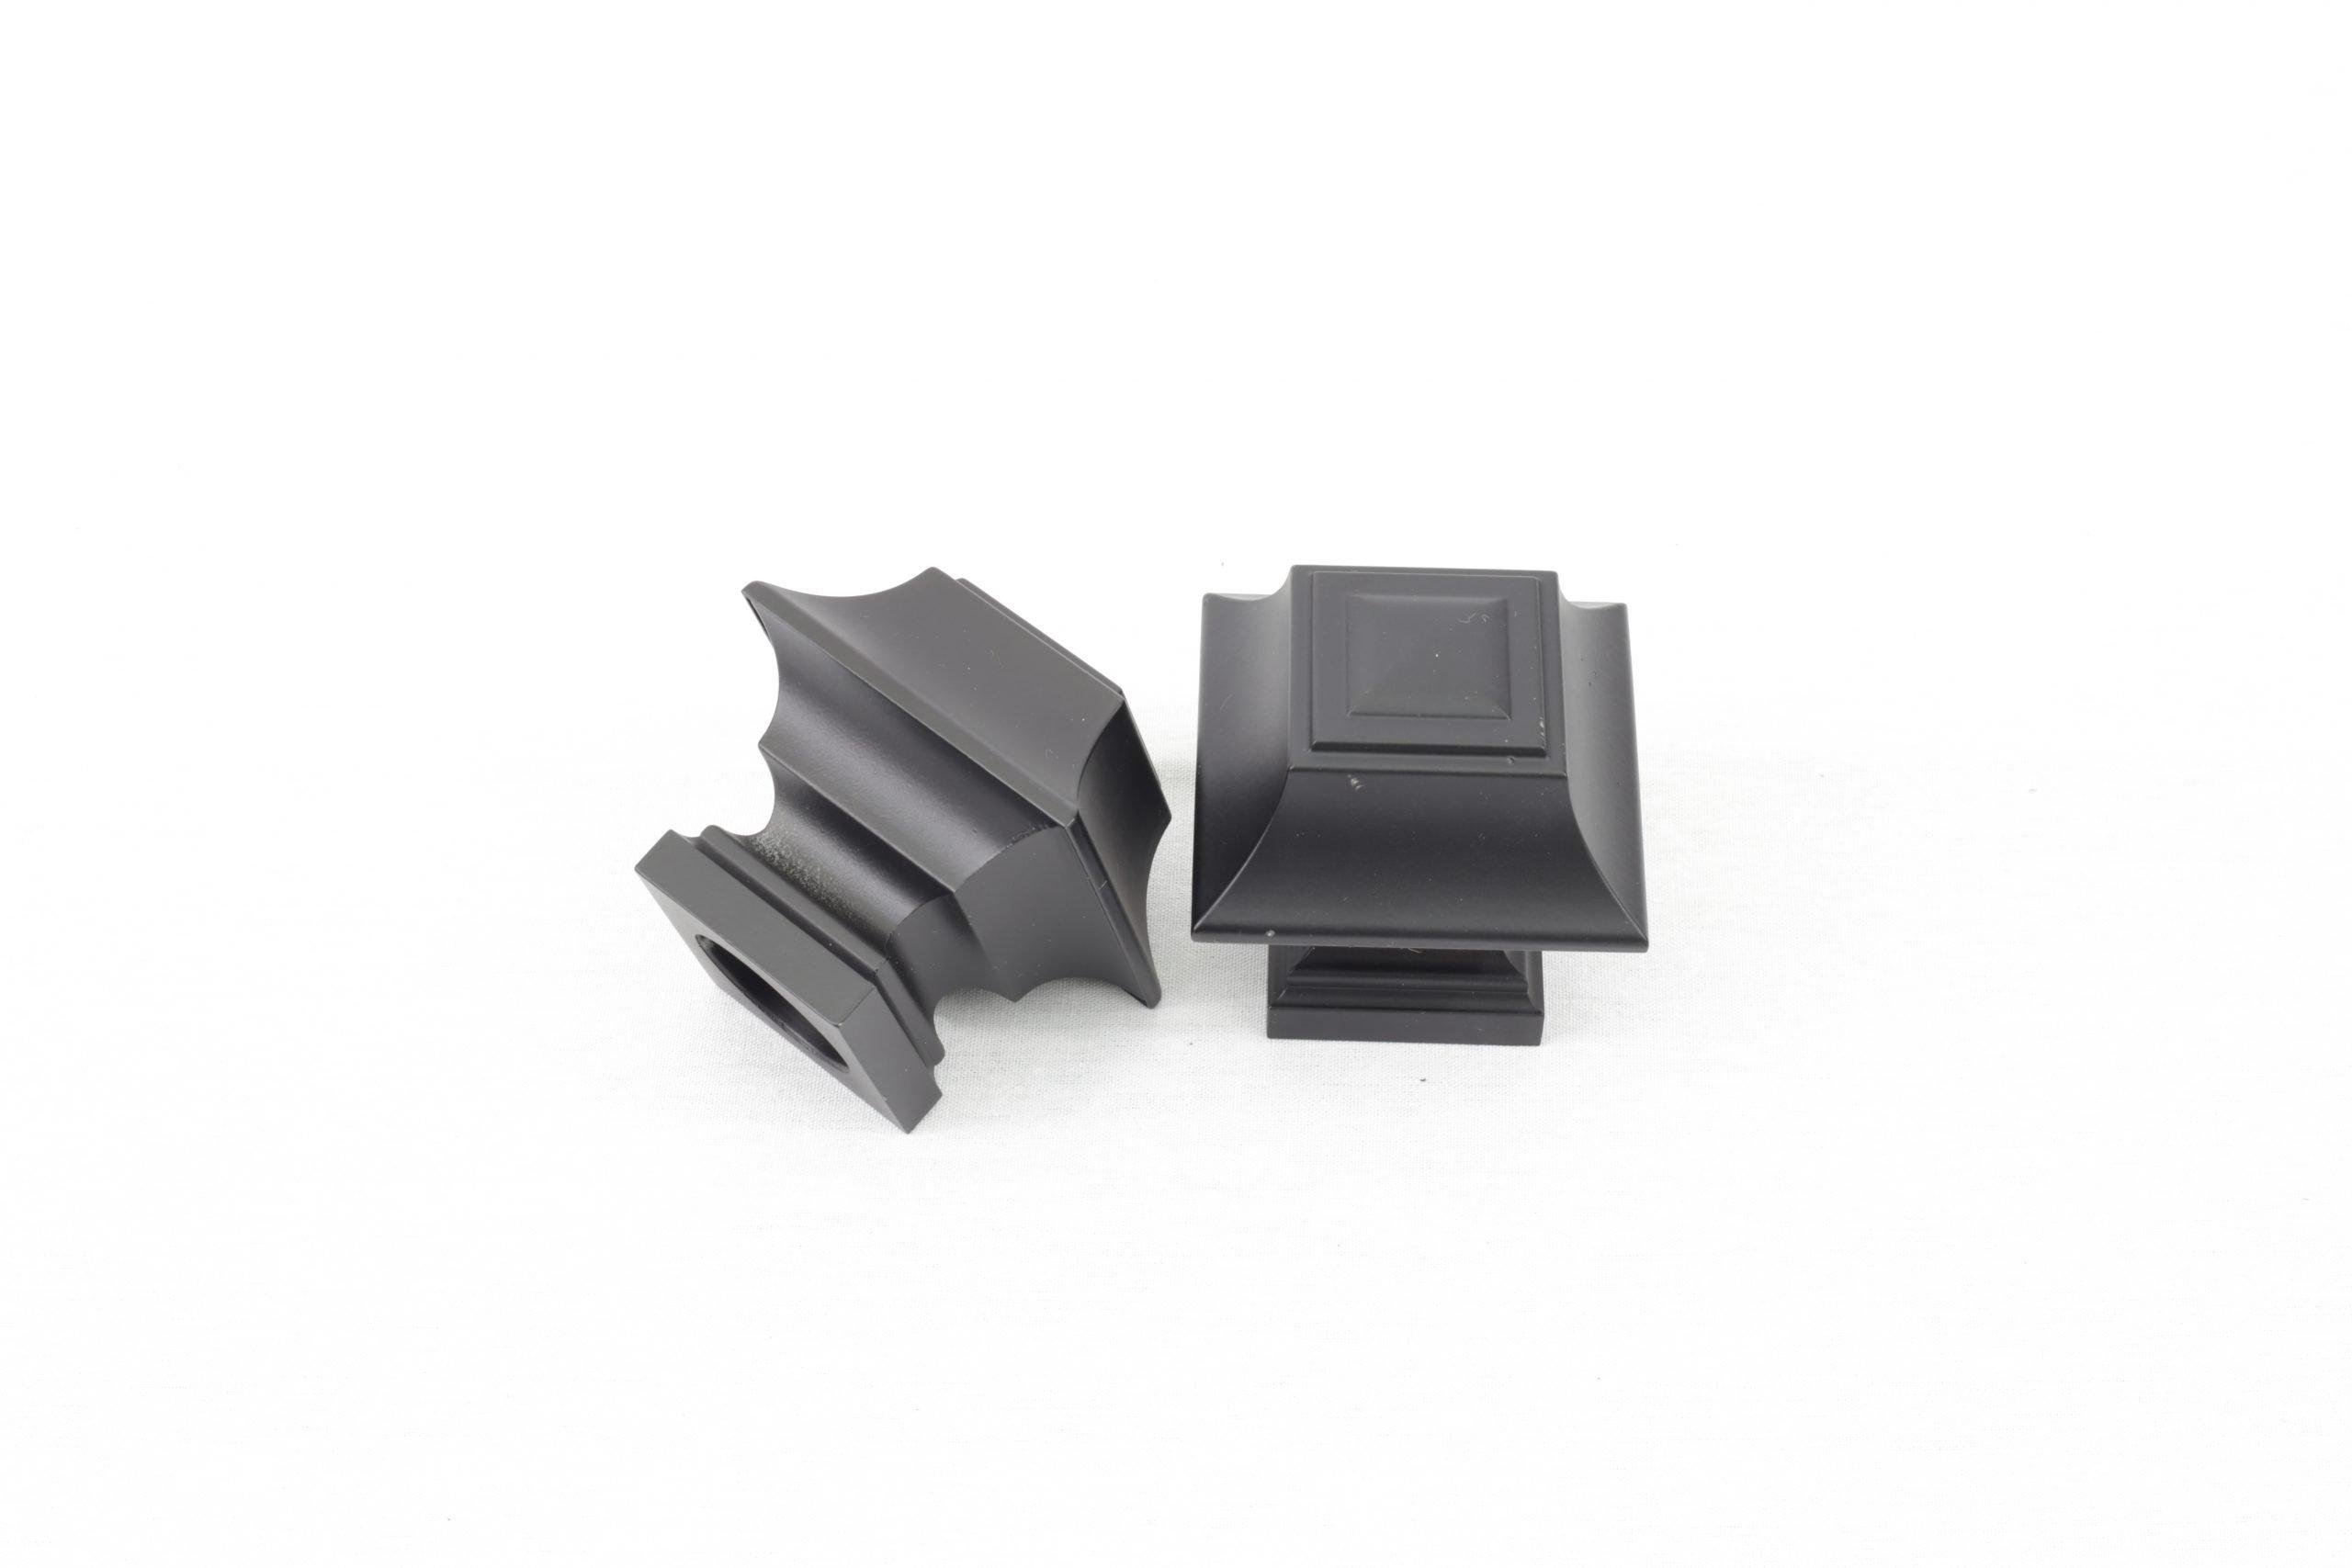 A decorative drapery hex finial in black